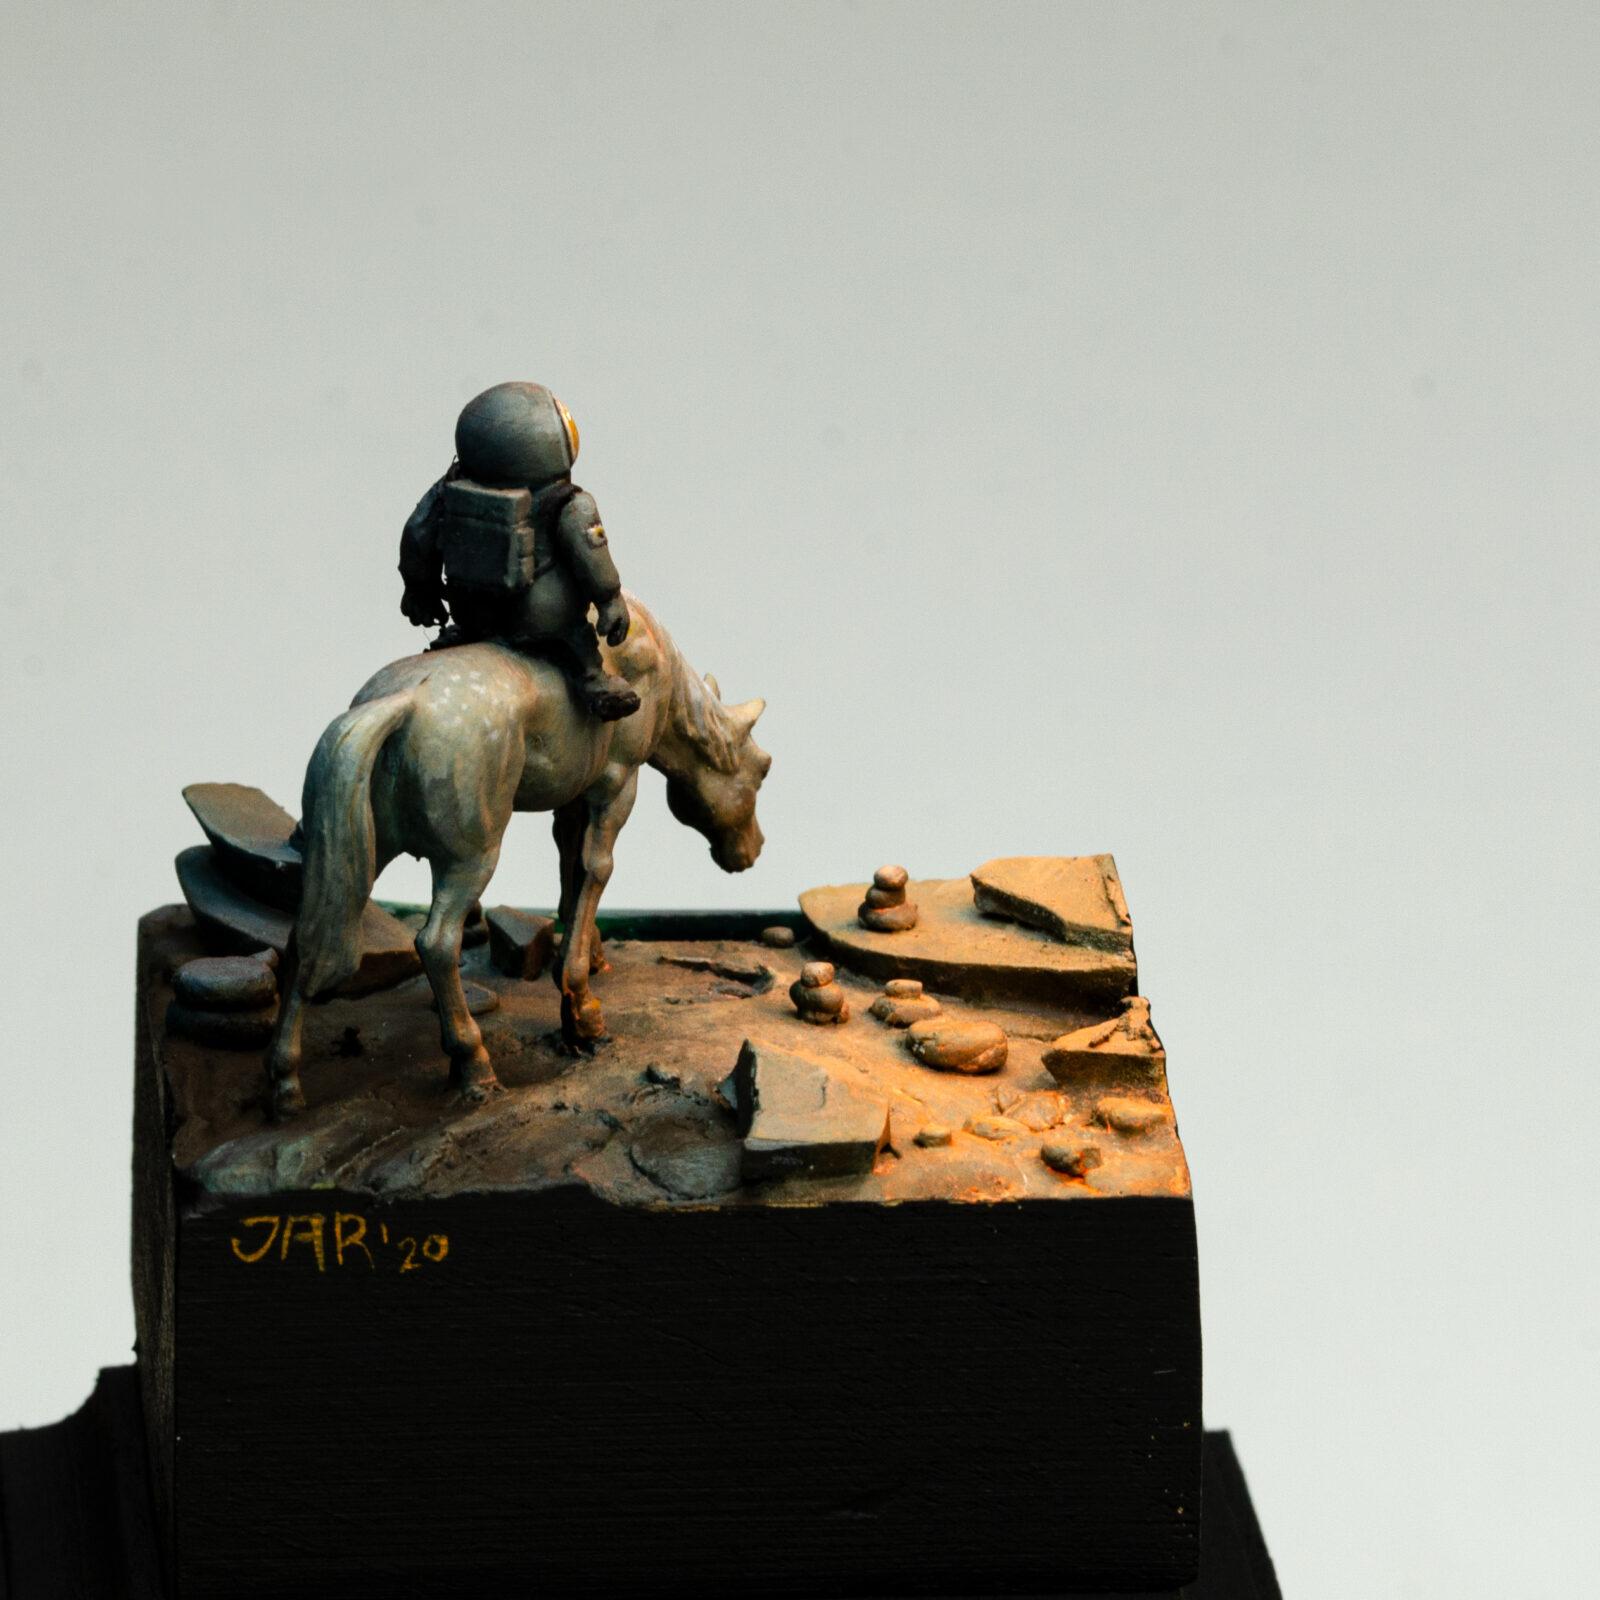 Palehorse12